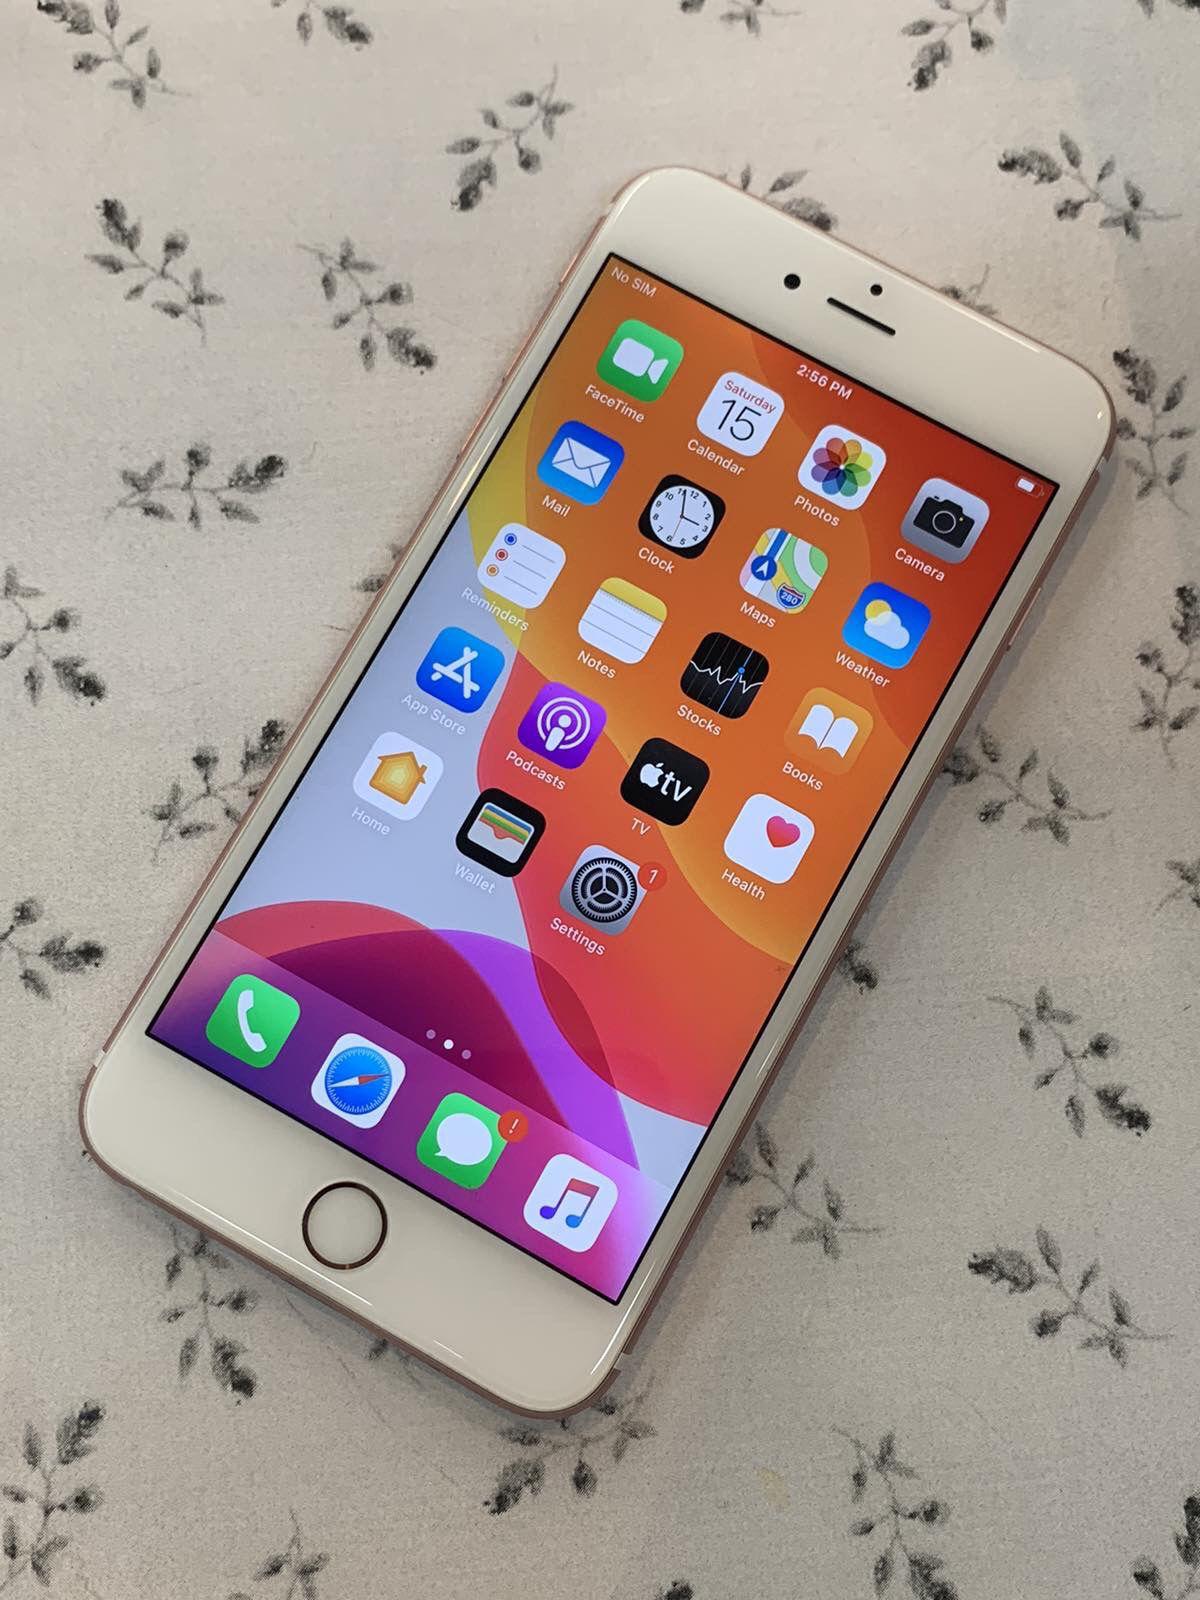 iPhone 6s Plus (64 GB) Unlocked With Warranty